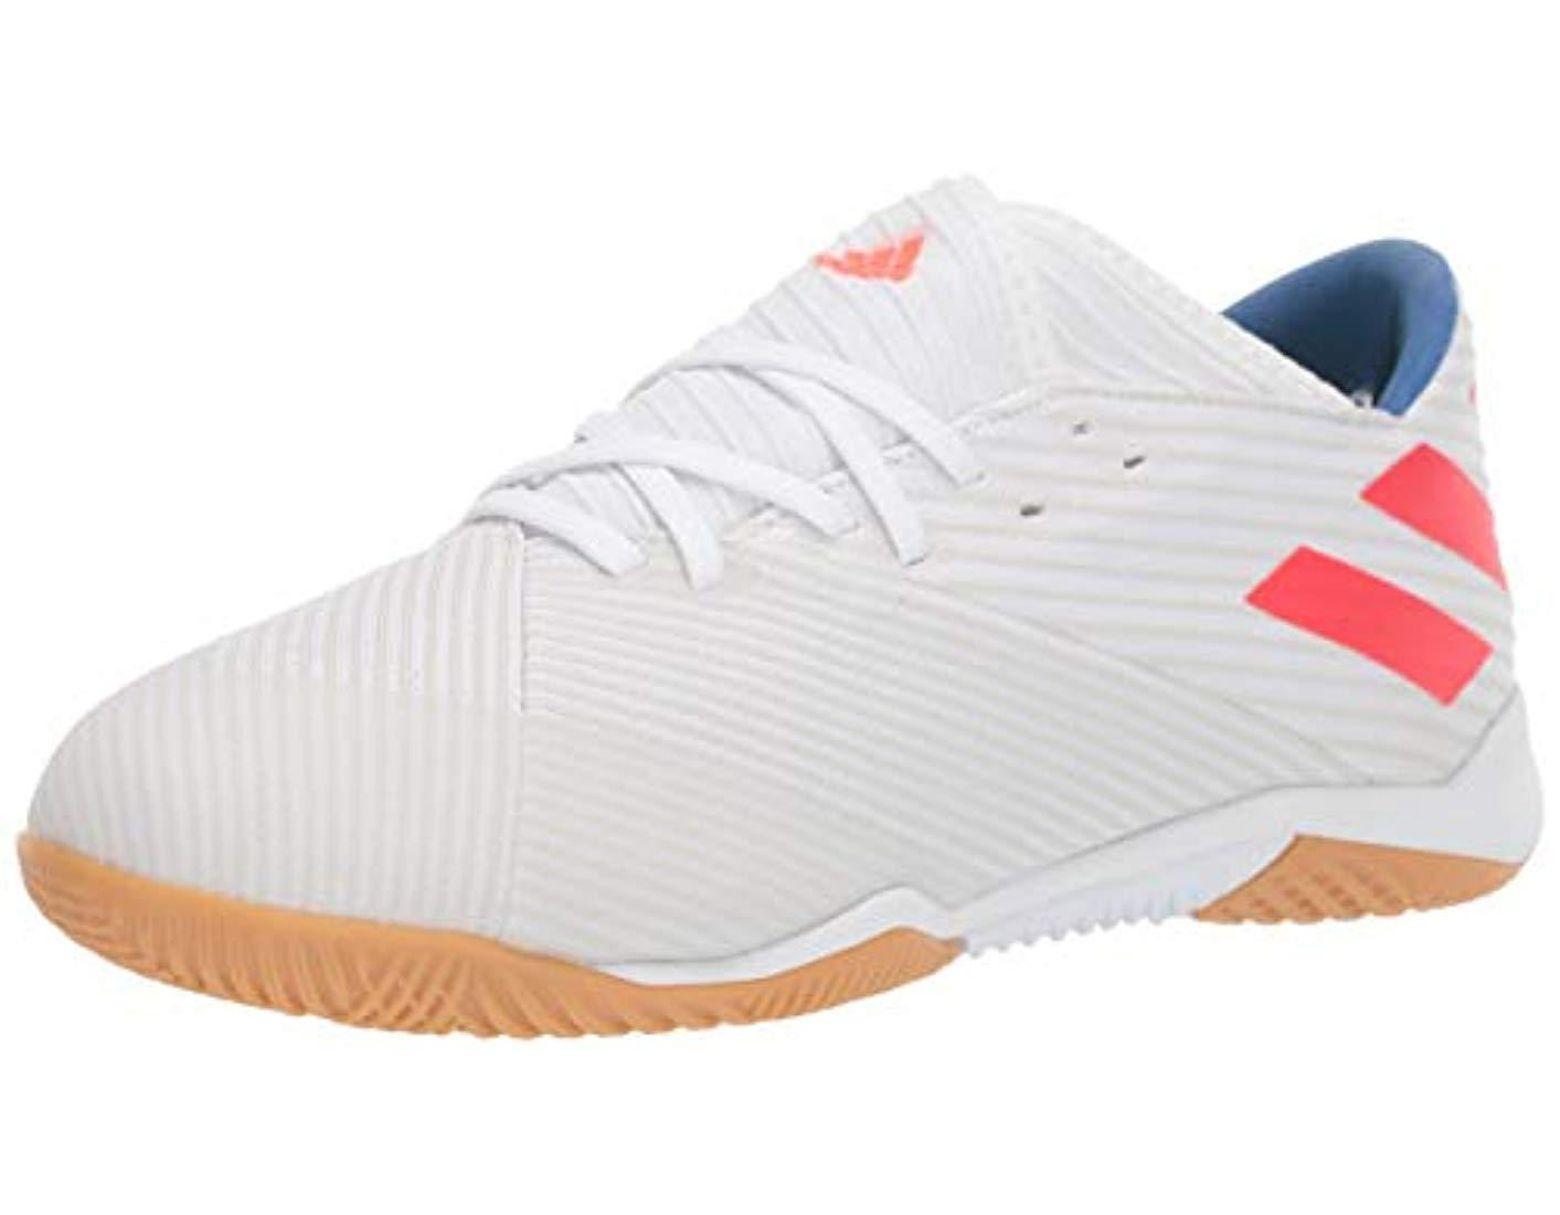 ff5a686f3eaac Men's White Nemeziz Messi 19.3 Indoor Shoes